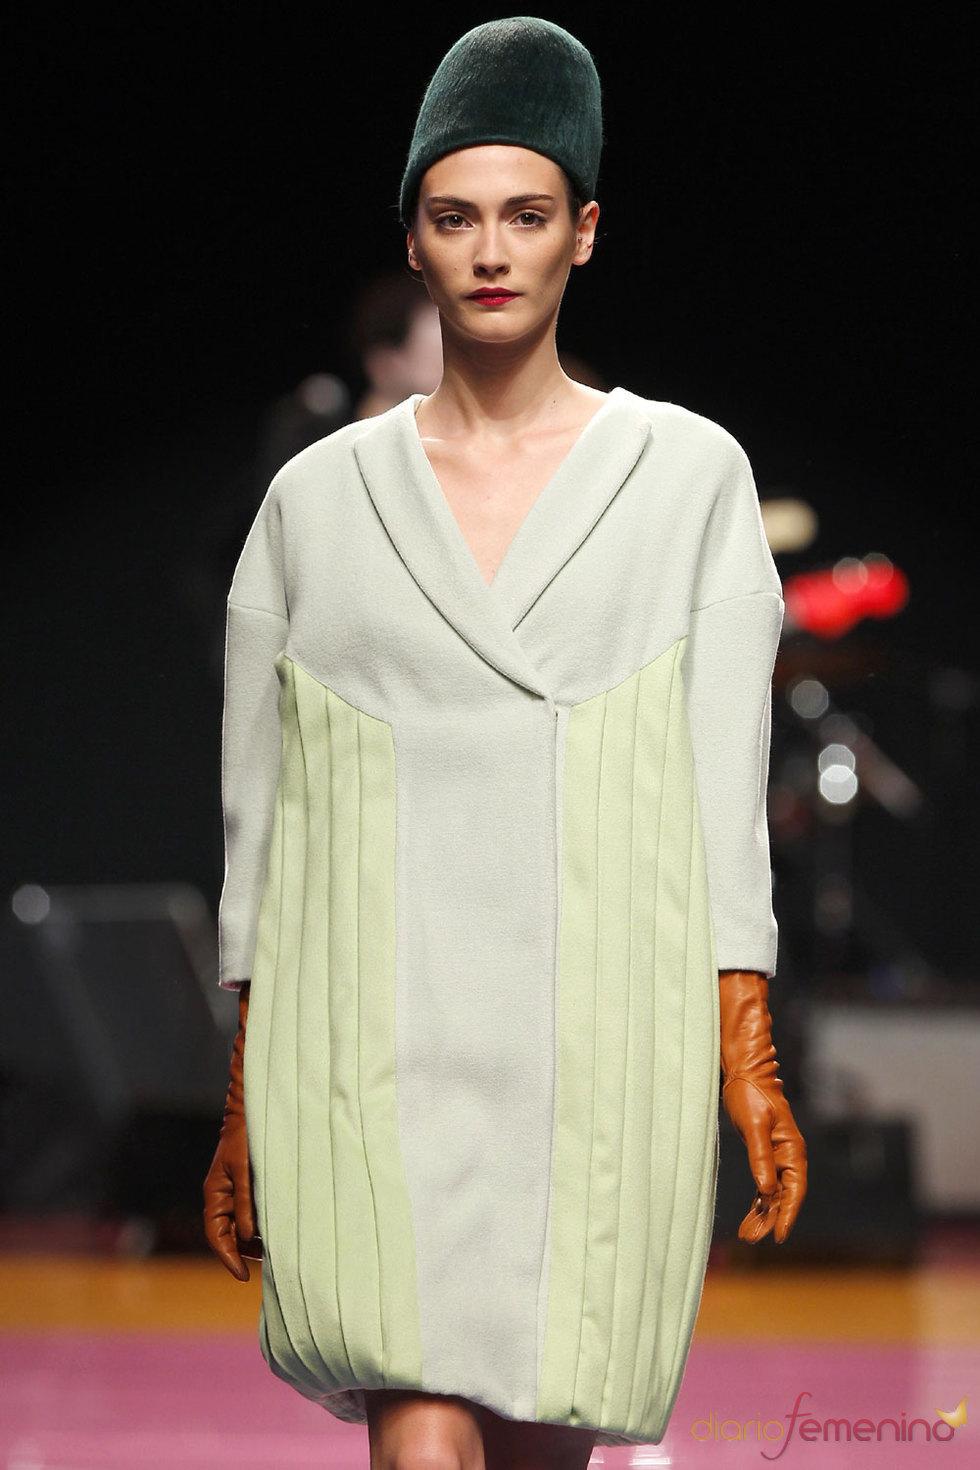 Cibeles Fashion Week - Moda Duyos 2010-2011